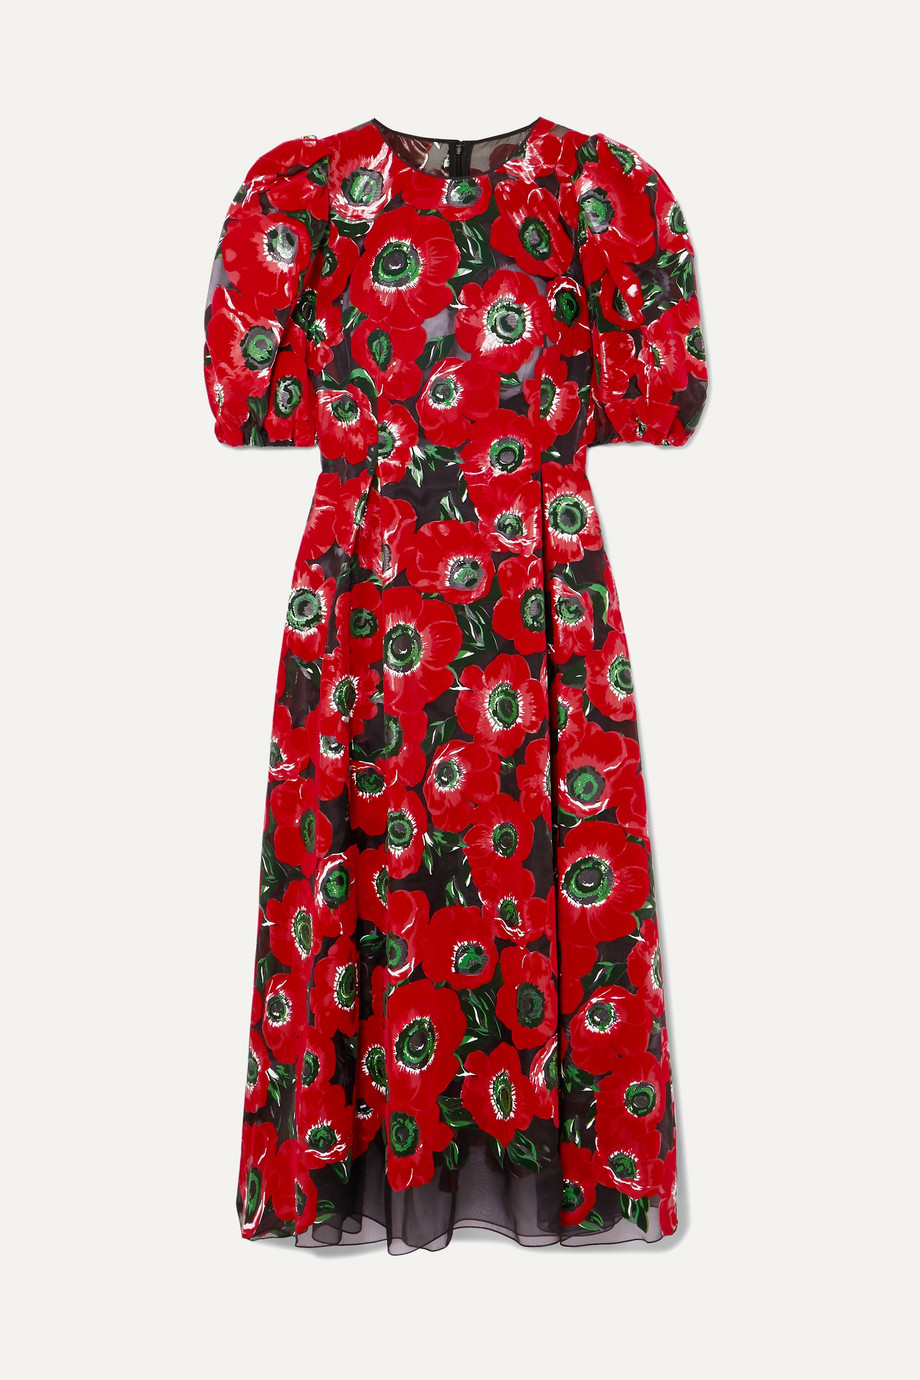 Dolce & Gabbana   Floral-print flocked georgette midi dress   NET-A-PORTER.COM